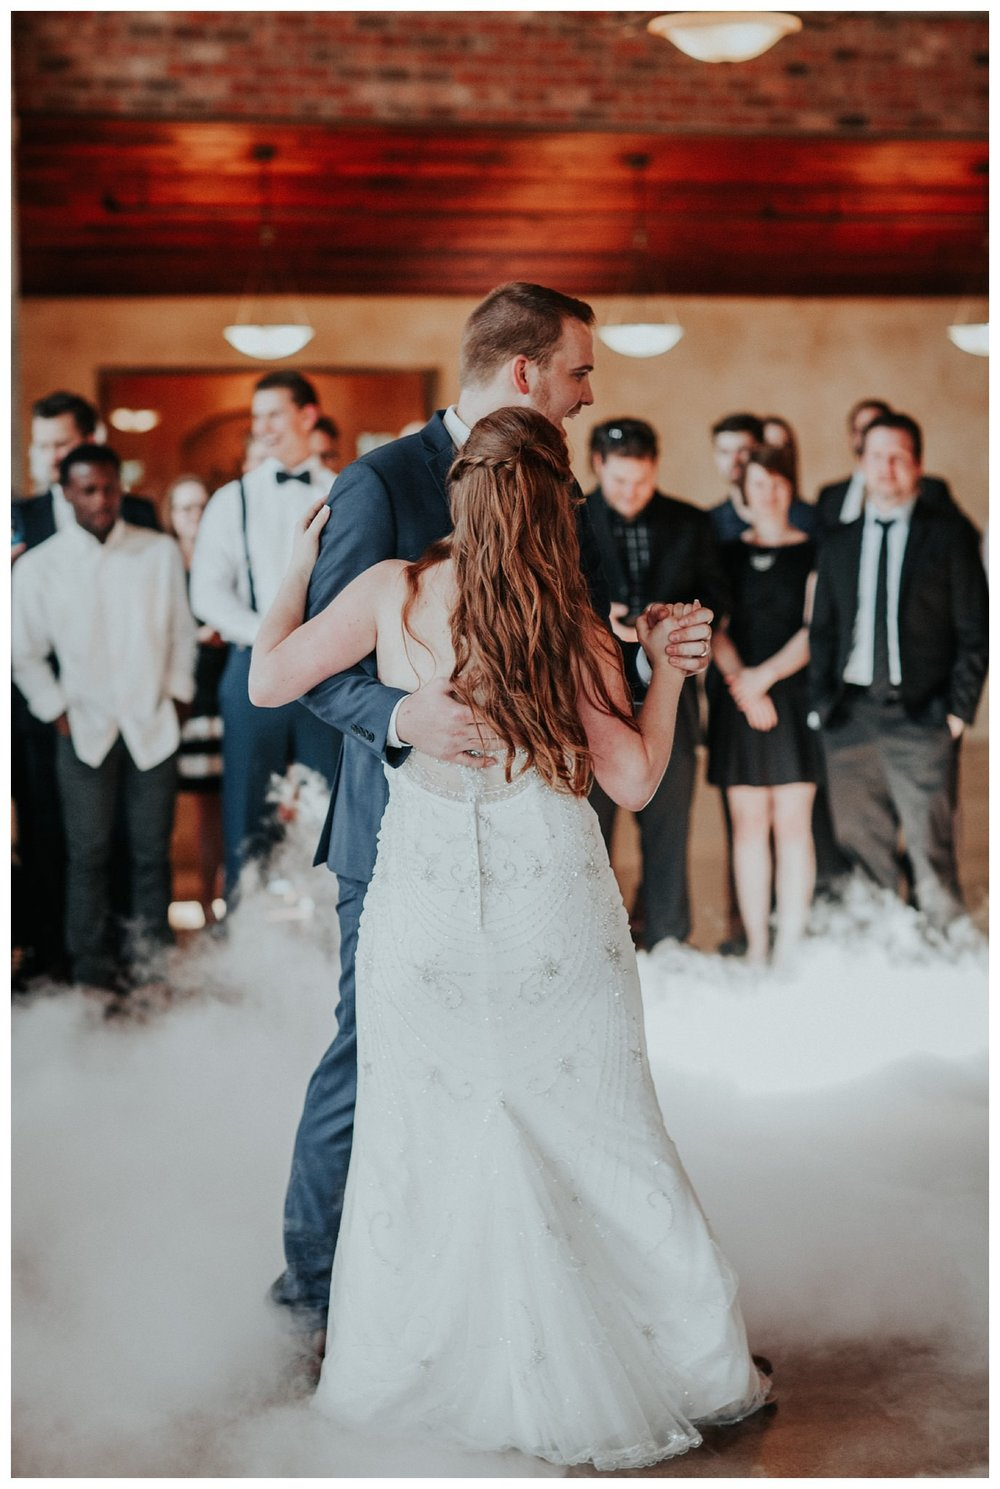 Summertime Olde Dobbin Station - Magnolia Wedding - The Woodlands Texas Wedding Photographer-2170.jpg